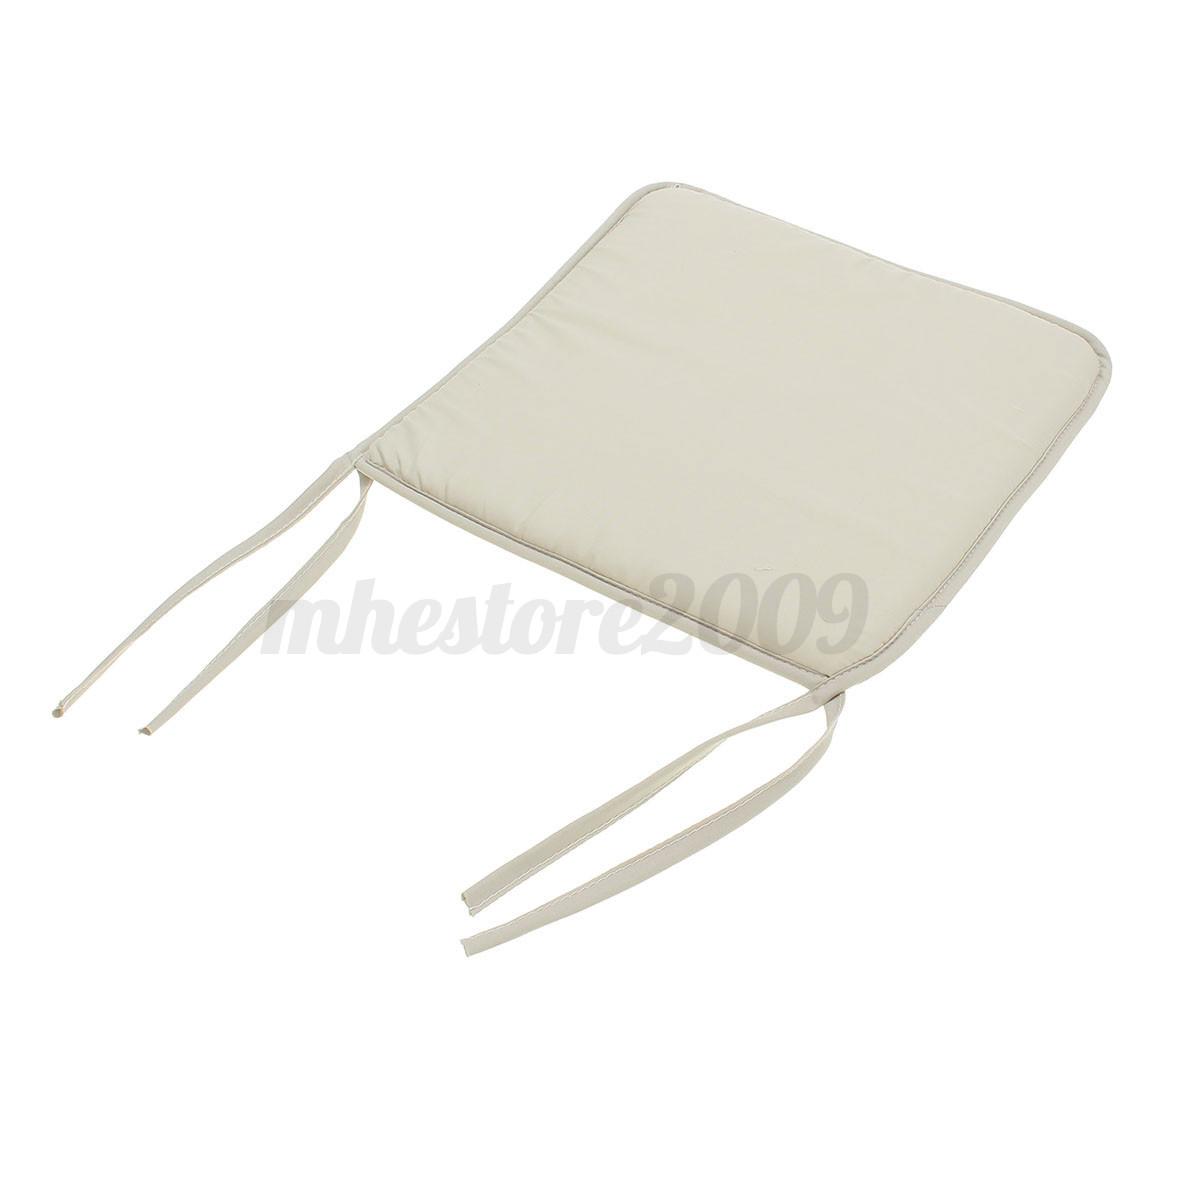 Soft Cushion Office Chair Garden Indoor Dining Seat Pad  : 8C8292979A3747908DC25623CFCFC6D6569B0BCB9ECA9D16CED236D96313CFD283CA99539FD2CAC62603D2169367CA8333C7CE9383731ECD9BA05323 from www.ebay.com size 1200 x 1200 jpeg 70kB